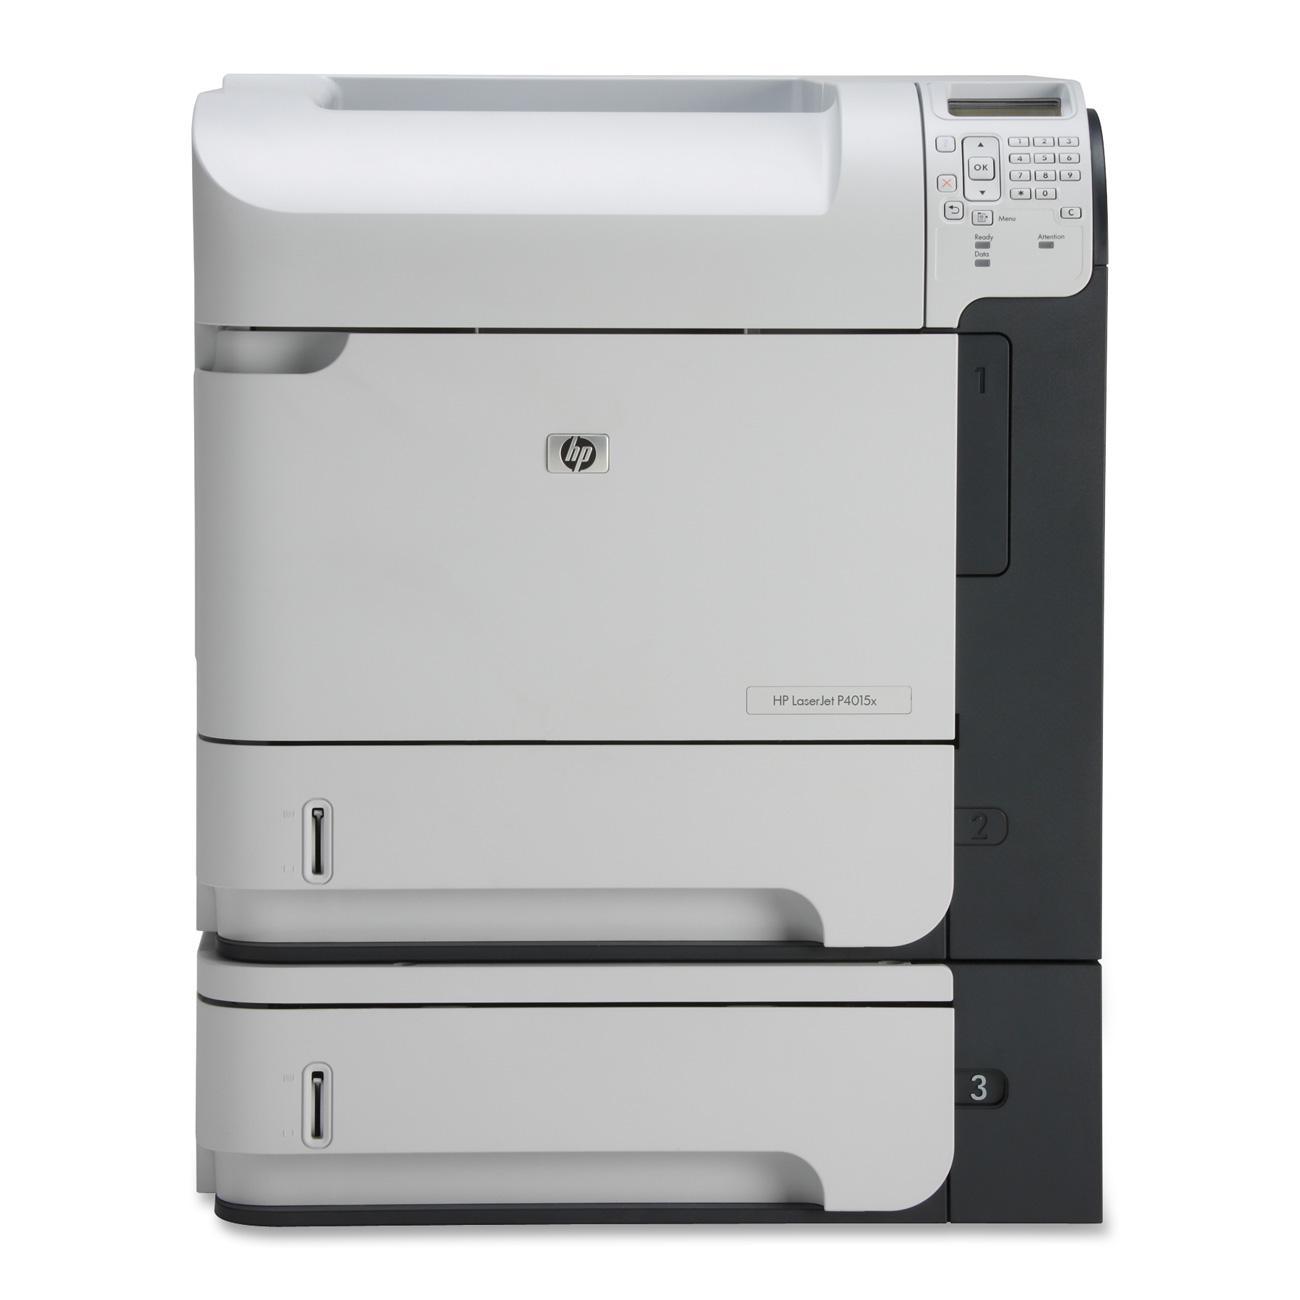 HP LaserJet P4015X Laser Printer - Monochrome - 1200 x 1200 dpi Print - Plain Paper Print - Desktop - 52 ppm Mono Print - Letter, Legal, Executive, Statement, Com10 Envelope, Monarch Envelope, Custom Size - 1100 sheets Standard Input Capacity - 225000 Dut 0